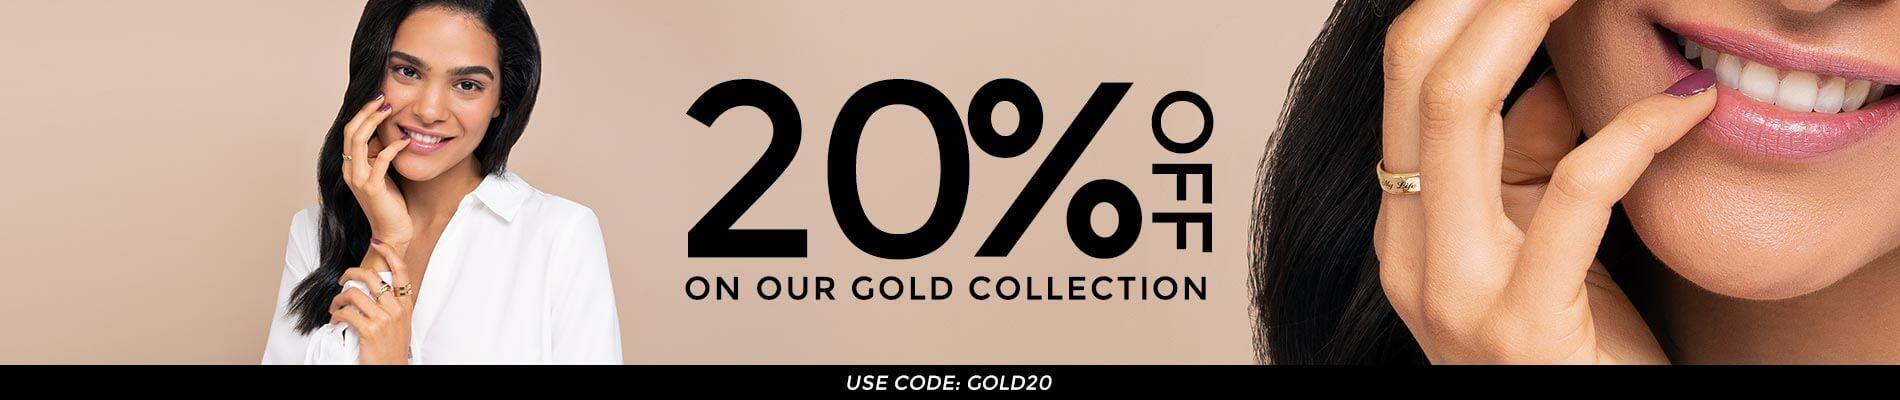 Gold Club desktop banner 20.07.20